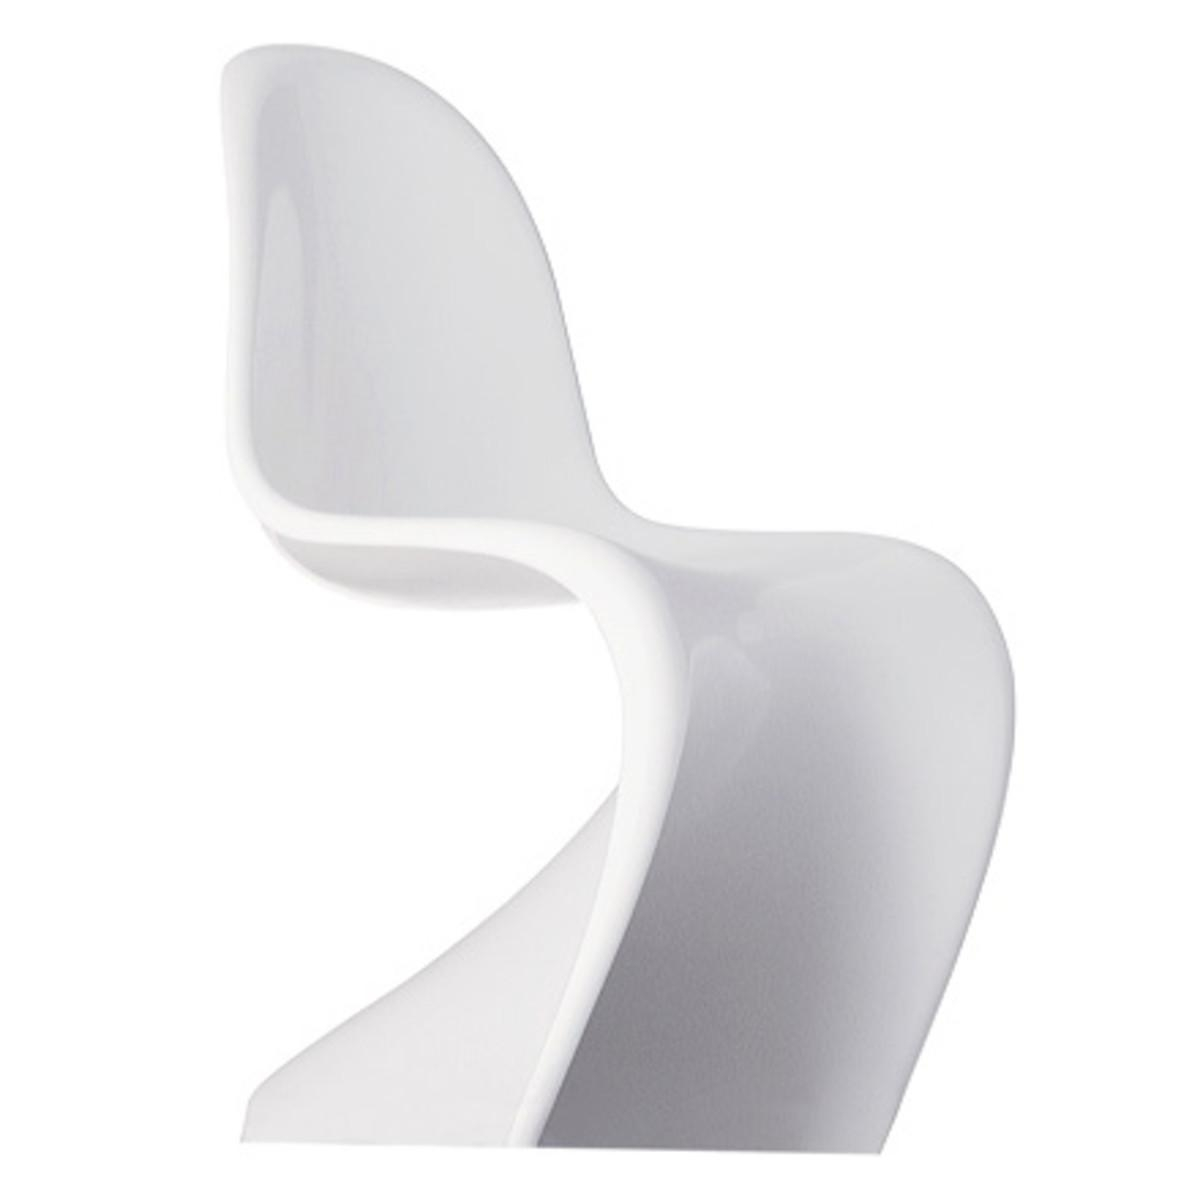 panton s chair replica folding papasan cover lookslikedesign